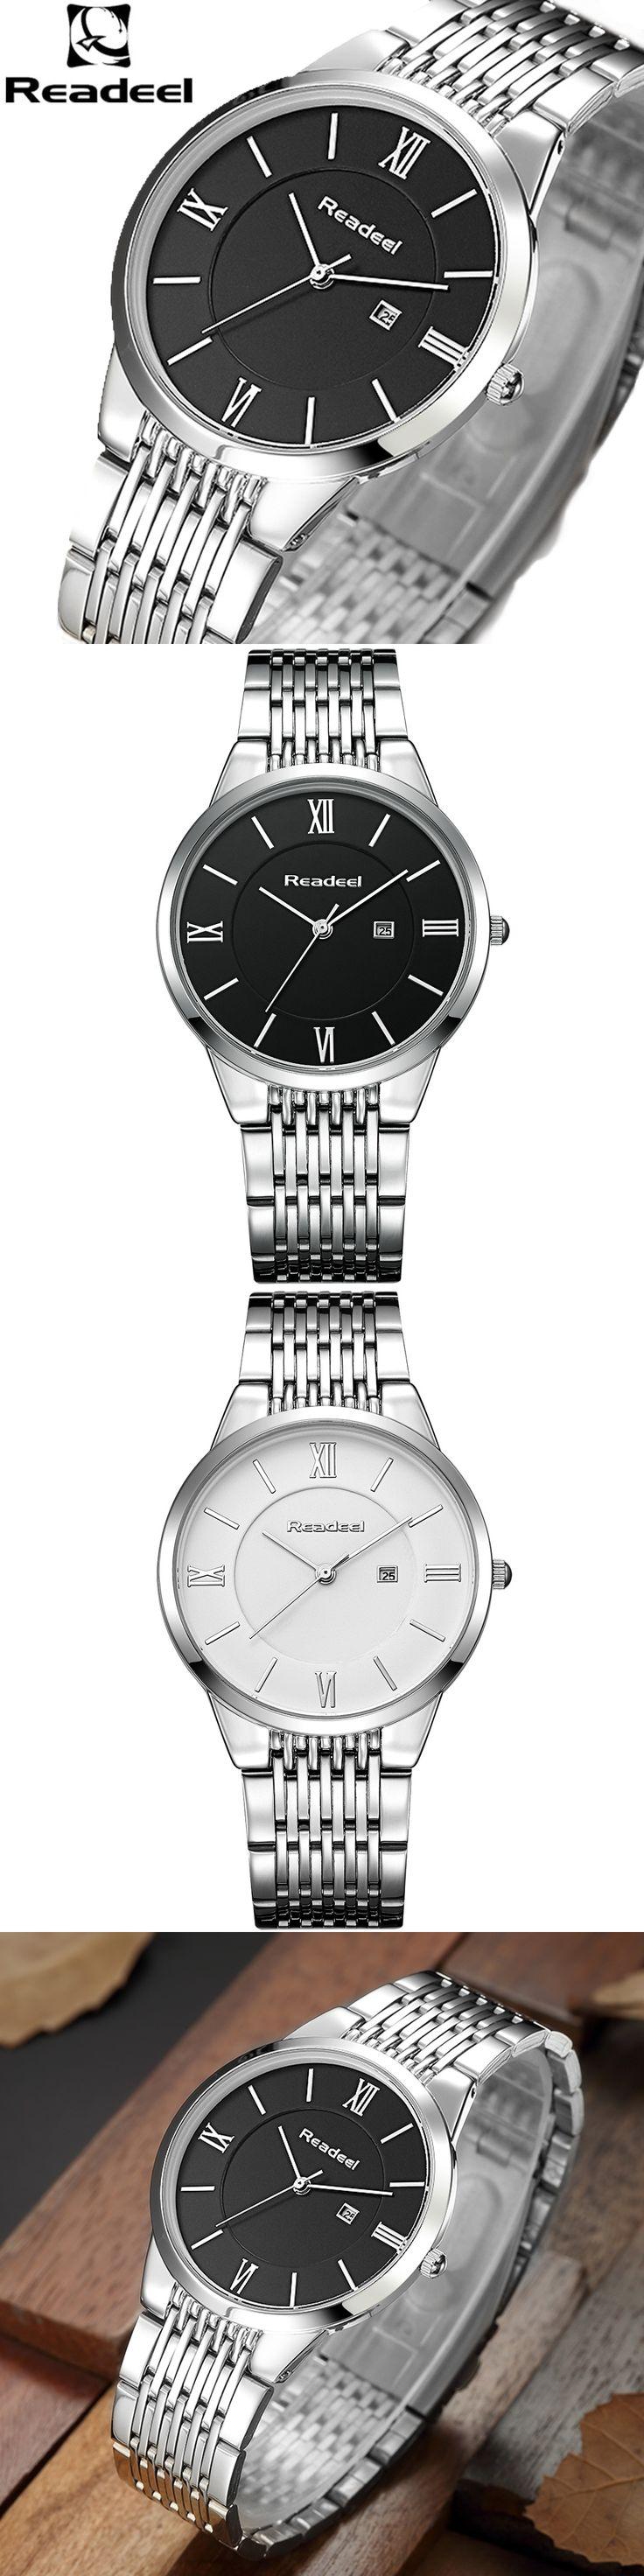 Readeel brand luxury watches men military wrist watch relojes analog sports watches relogio masculino esportivo shock clock men